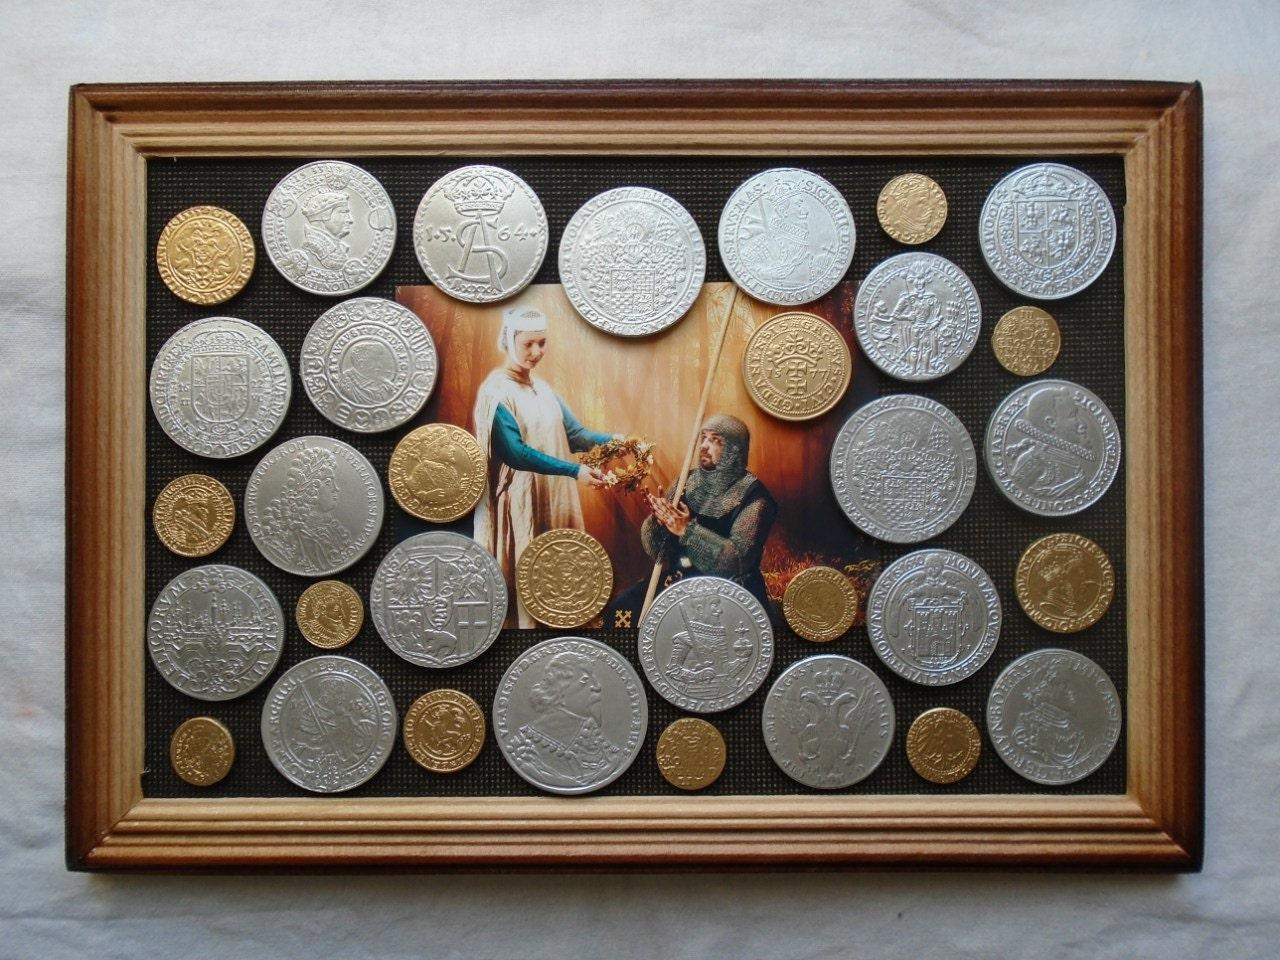 Wall Decor Gypsum : Crusaders gypsum coins wall art decor composition x